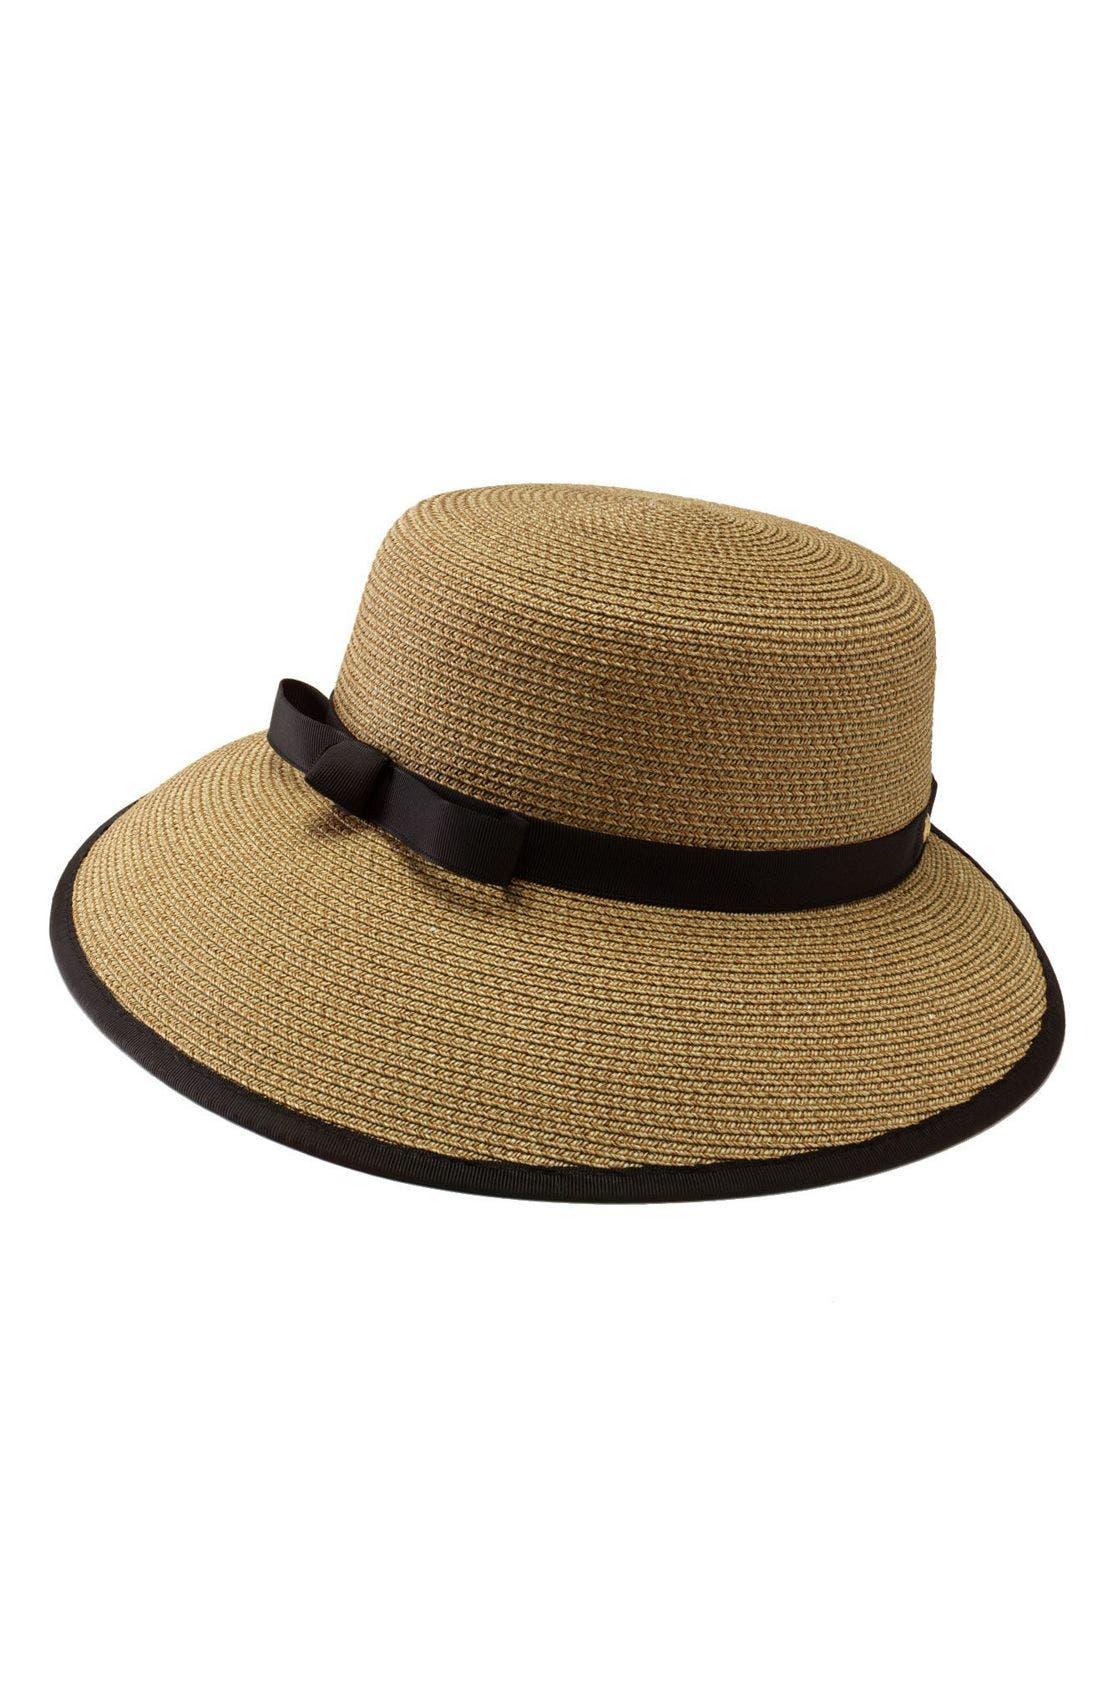 Squishee<sup>®</sup> Straw Cap,                         Main,                         color, Natural/Black